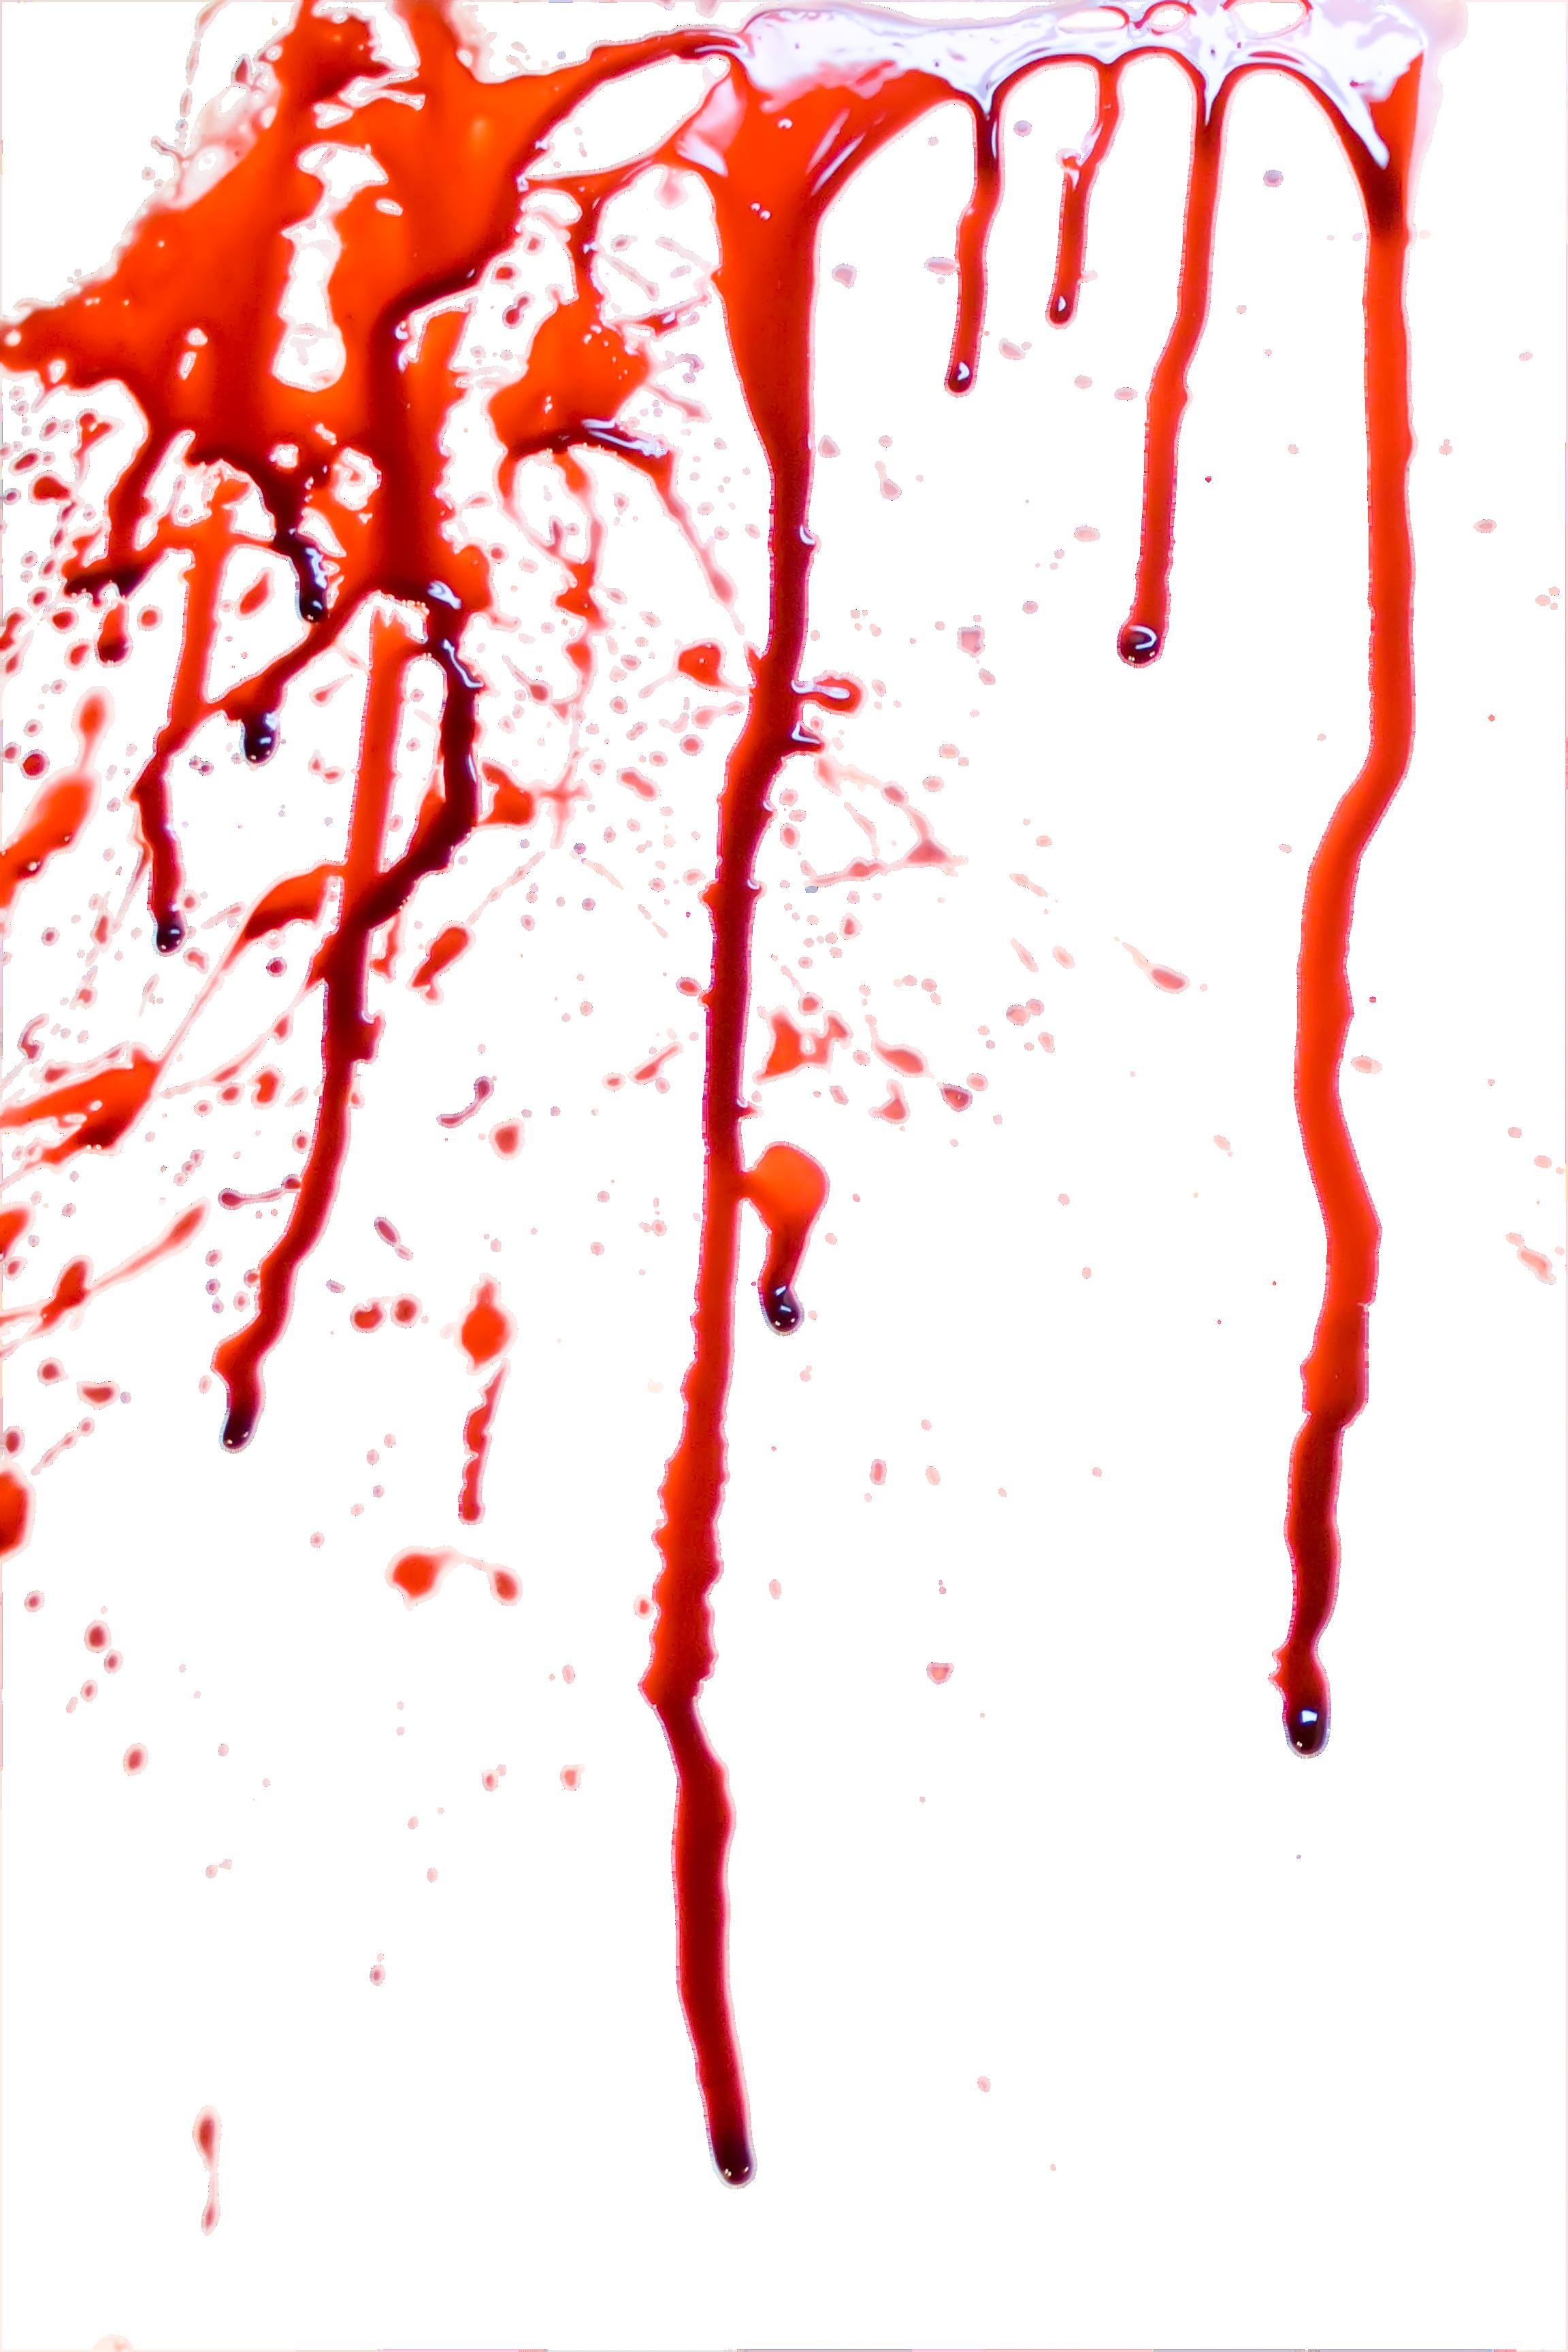 Blood PNG images free download, blood PNG splashes.